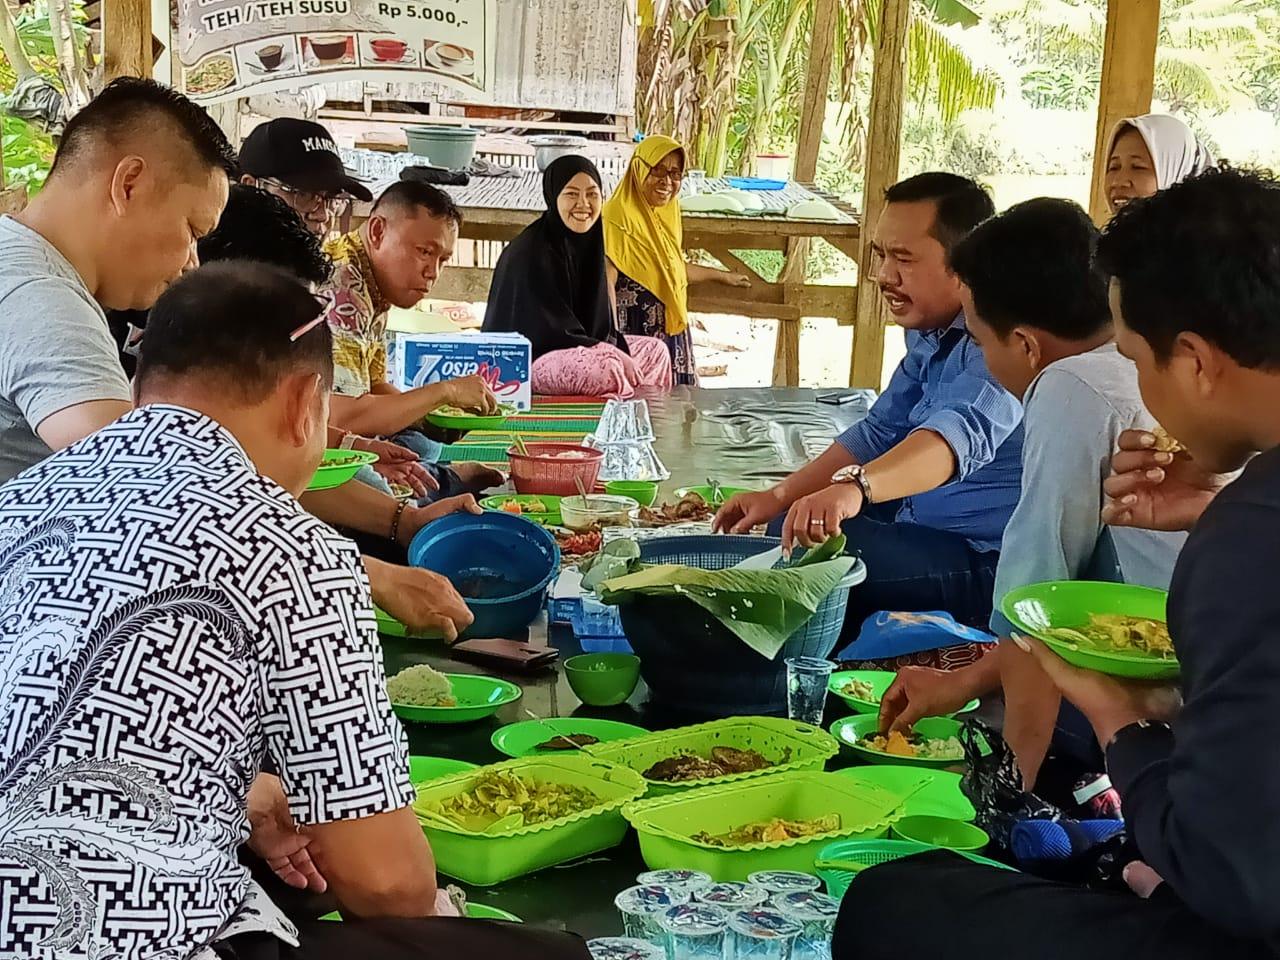 Rombongan Kakanwil Kemenag Berakhir Pekan di Obyek Wisata Pemancingan Wanua Lawiu Soppeng